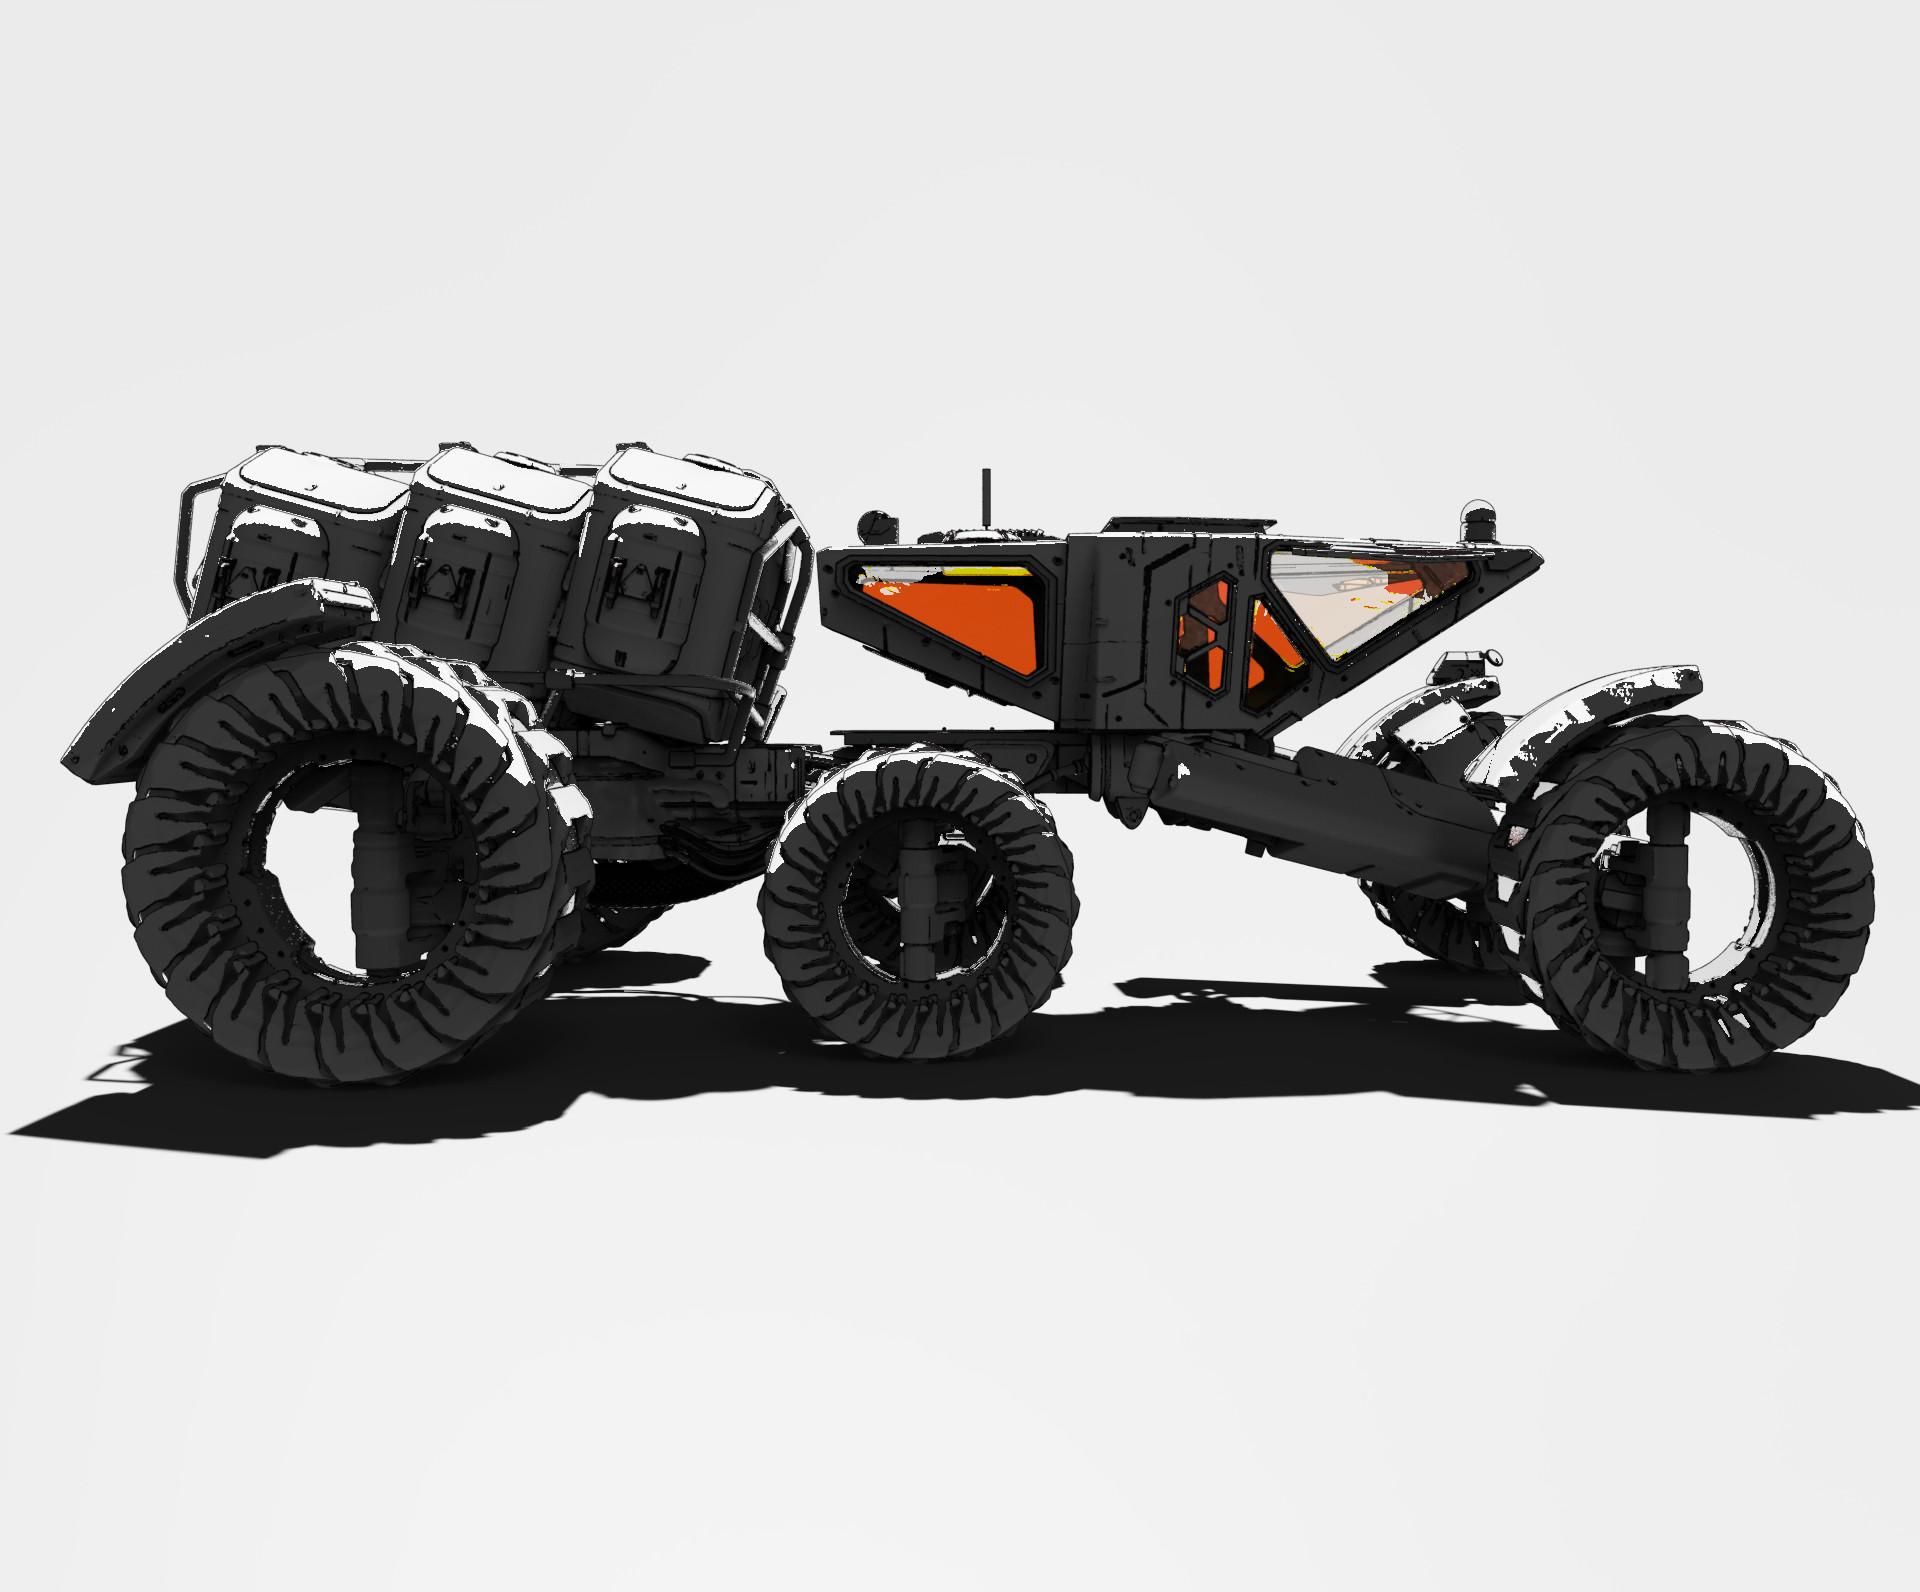 Roberto robert mars buggy kitbash 59